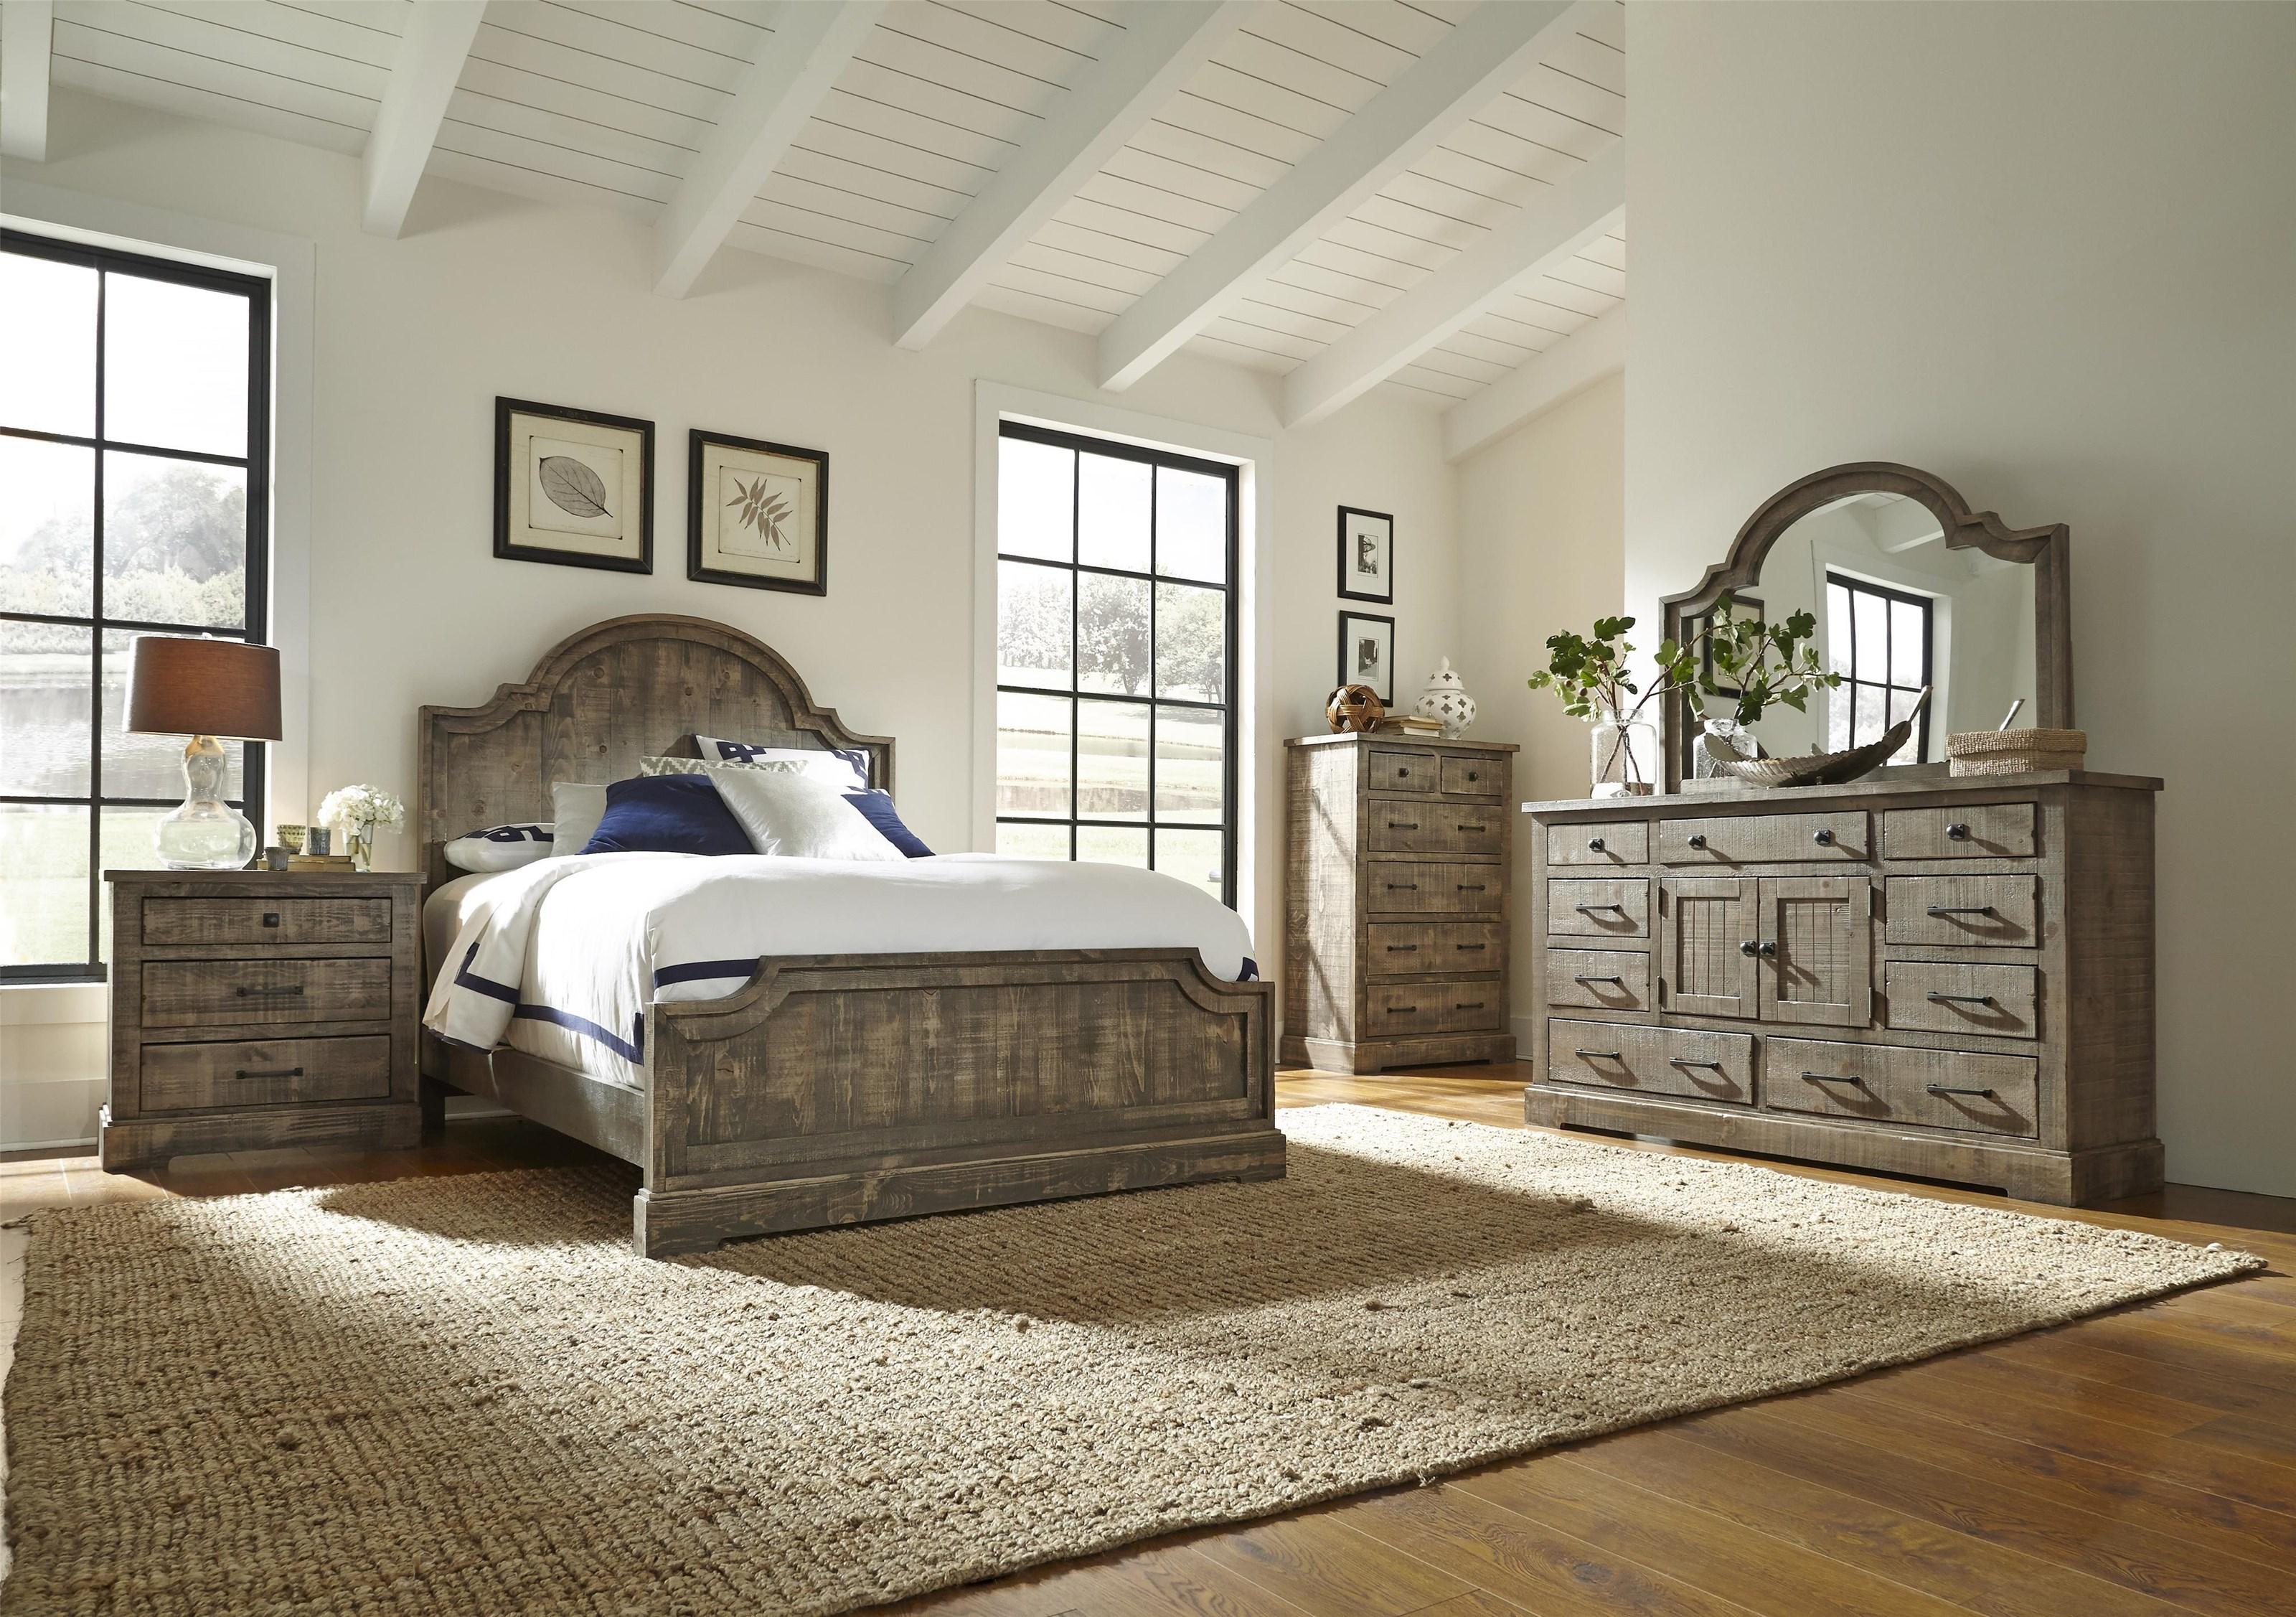 Progressive Furniture Meadow P632-94-95-78-24-50-2x43-14 8 Piece ...